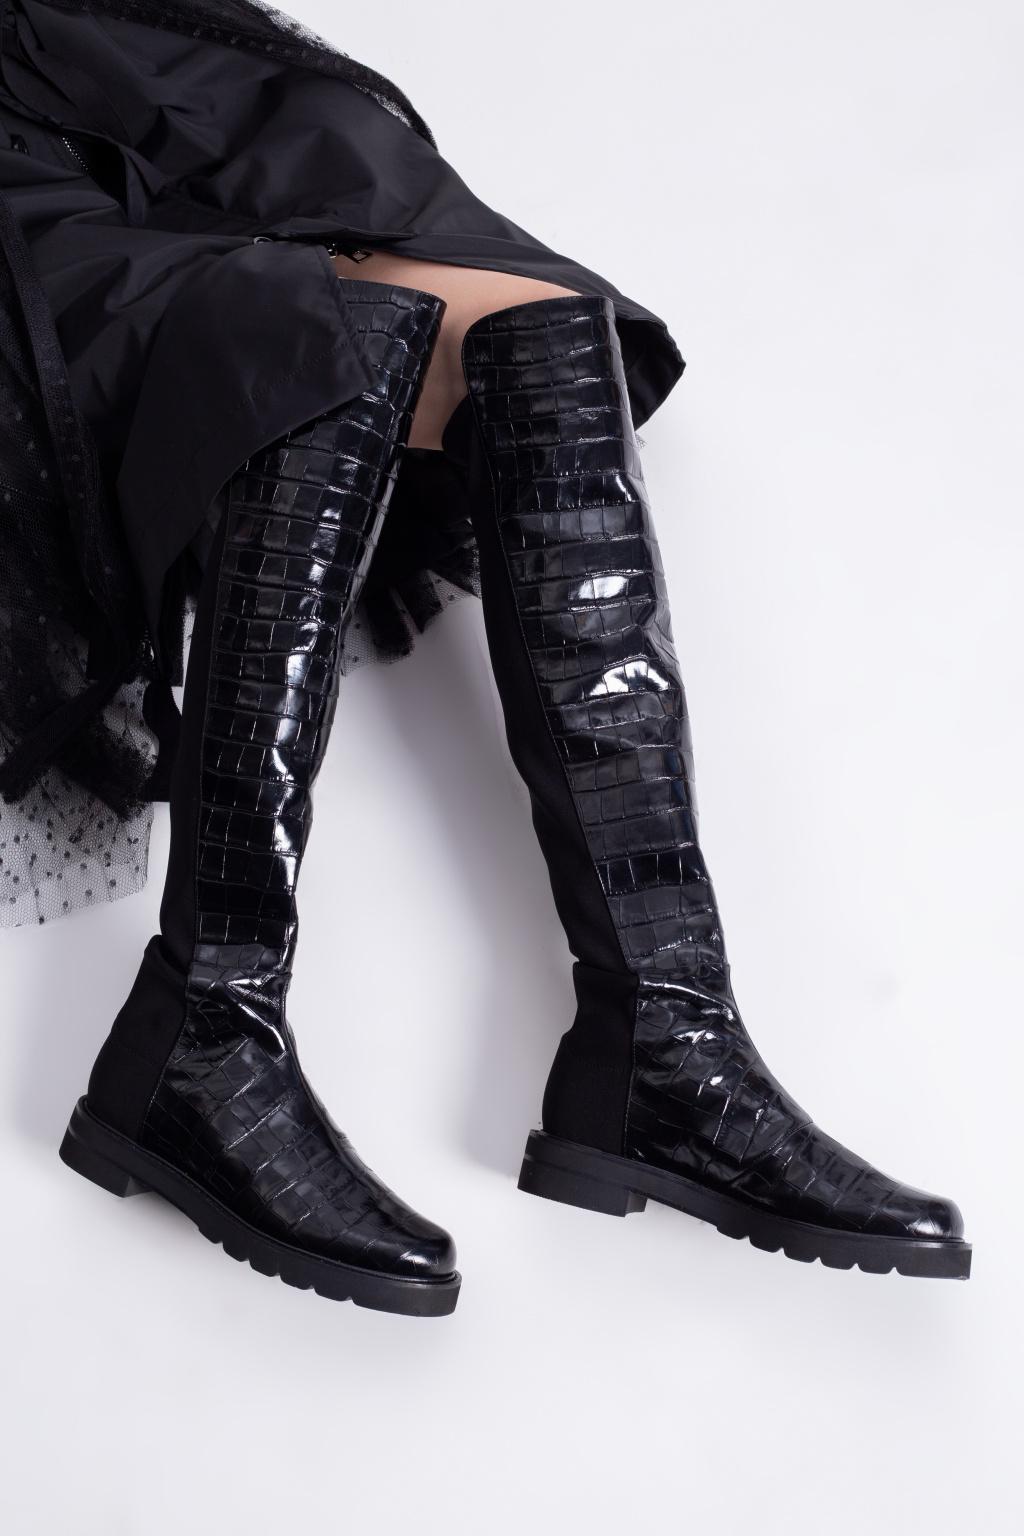 Stuart Weitzman 'Lift' leather boots